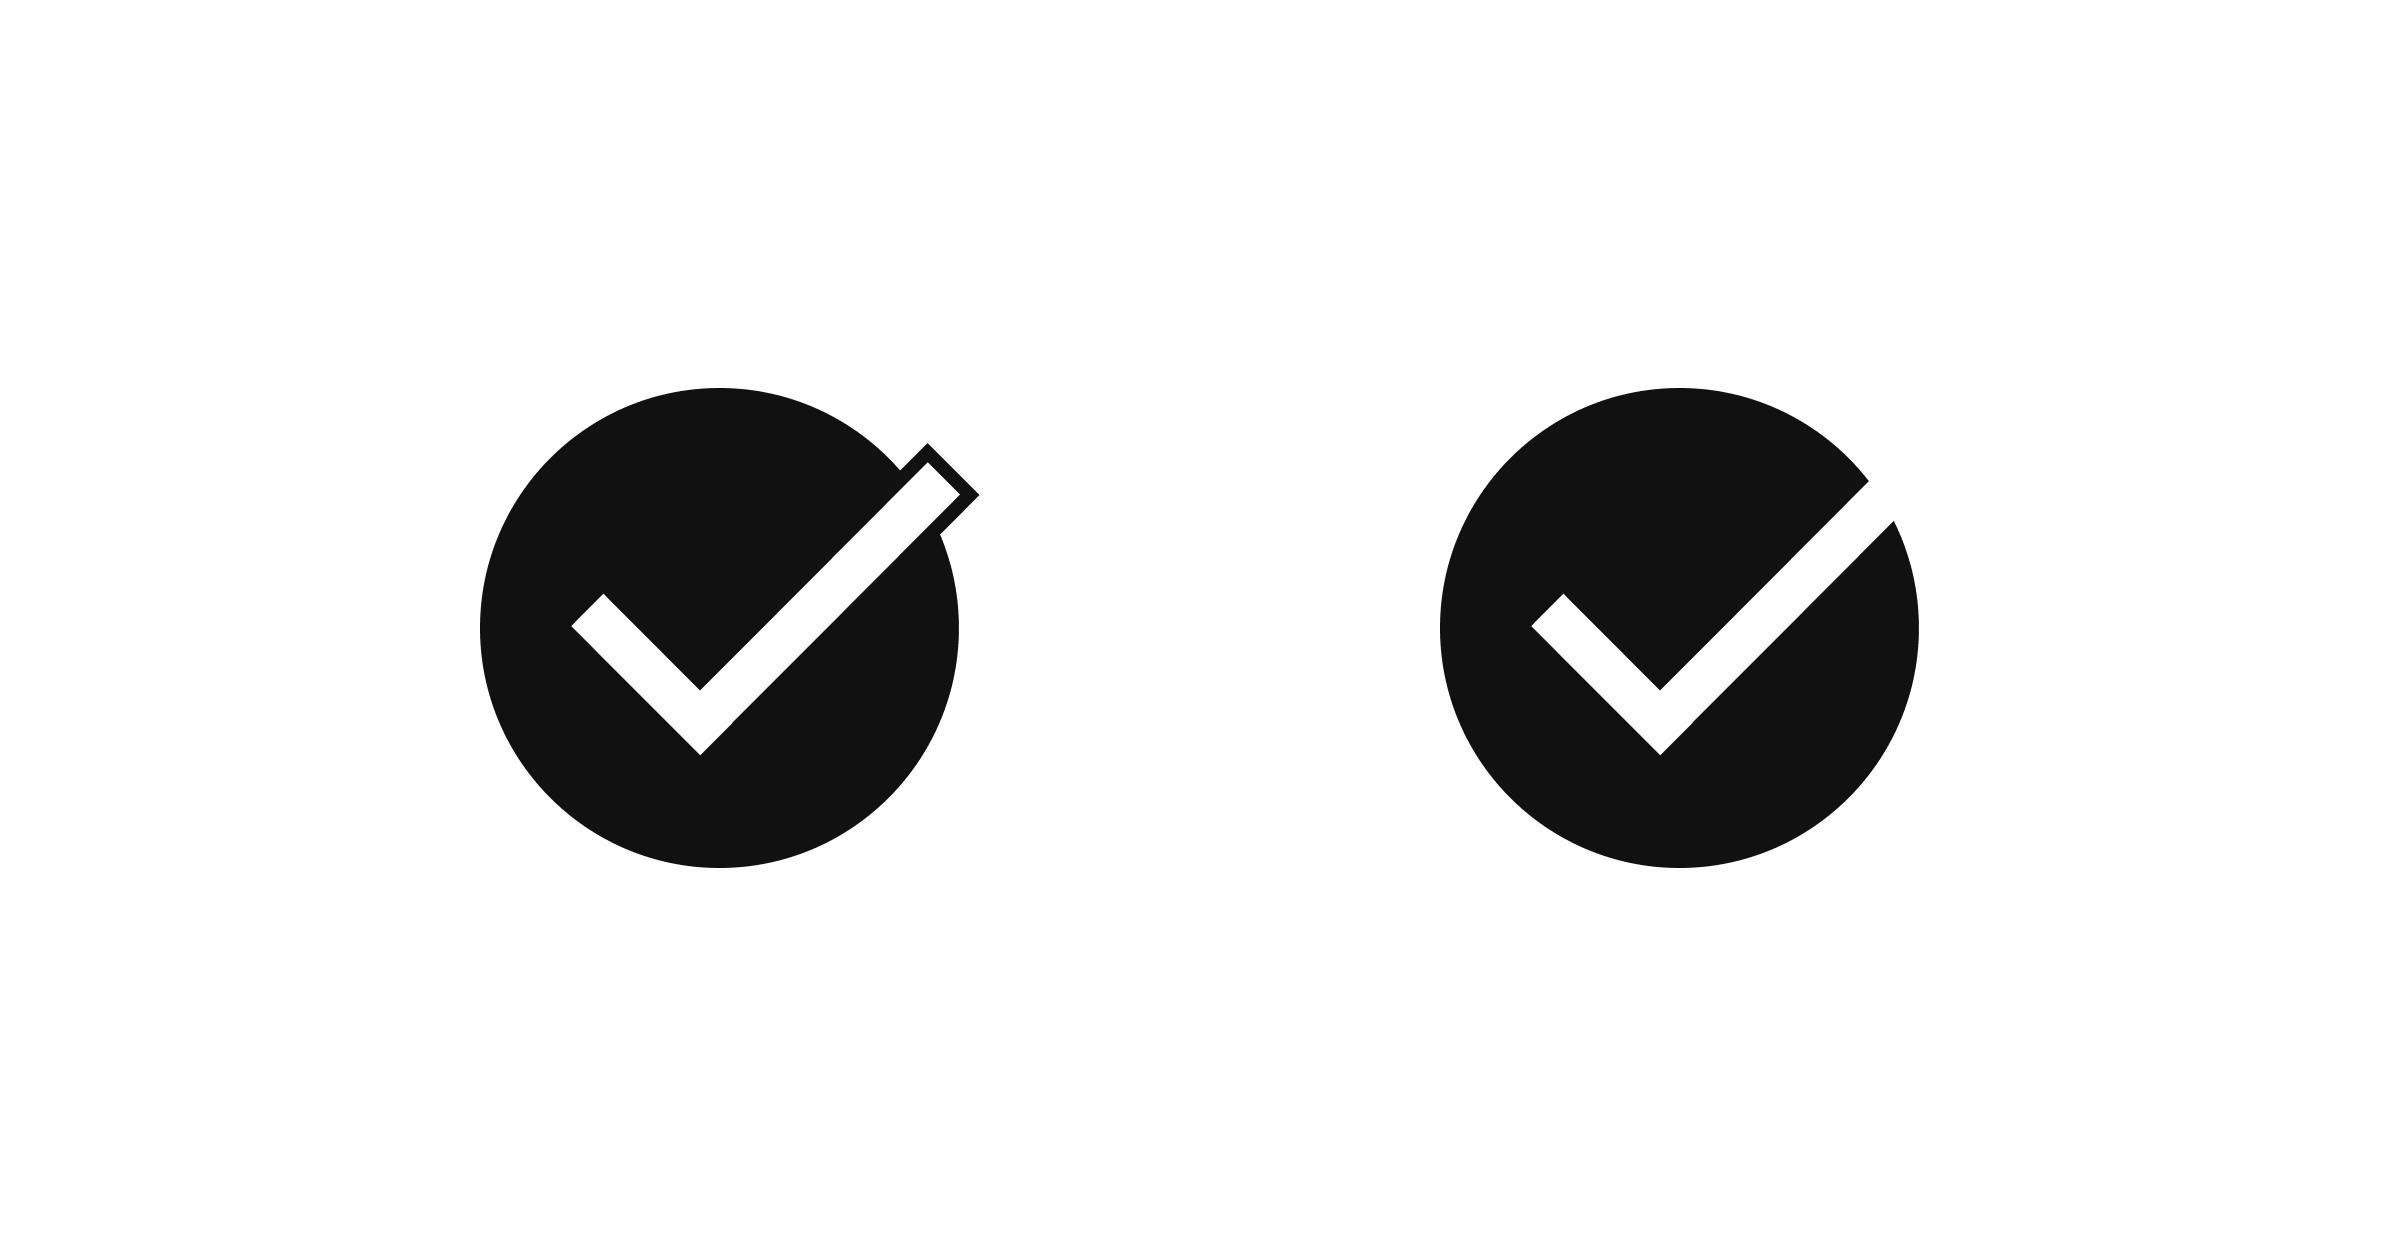 Chl.st logo work-in-progress